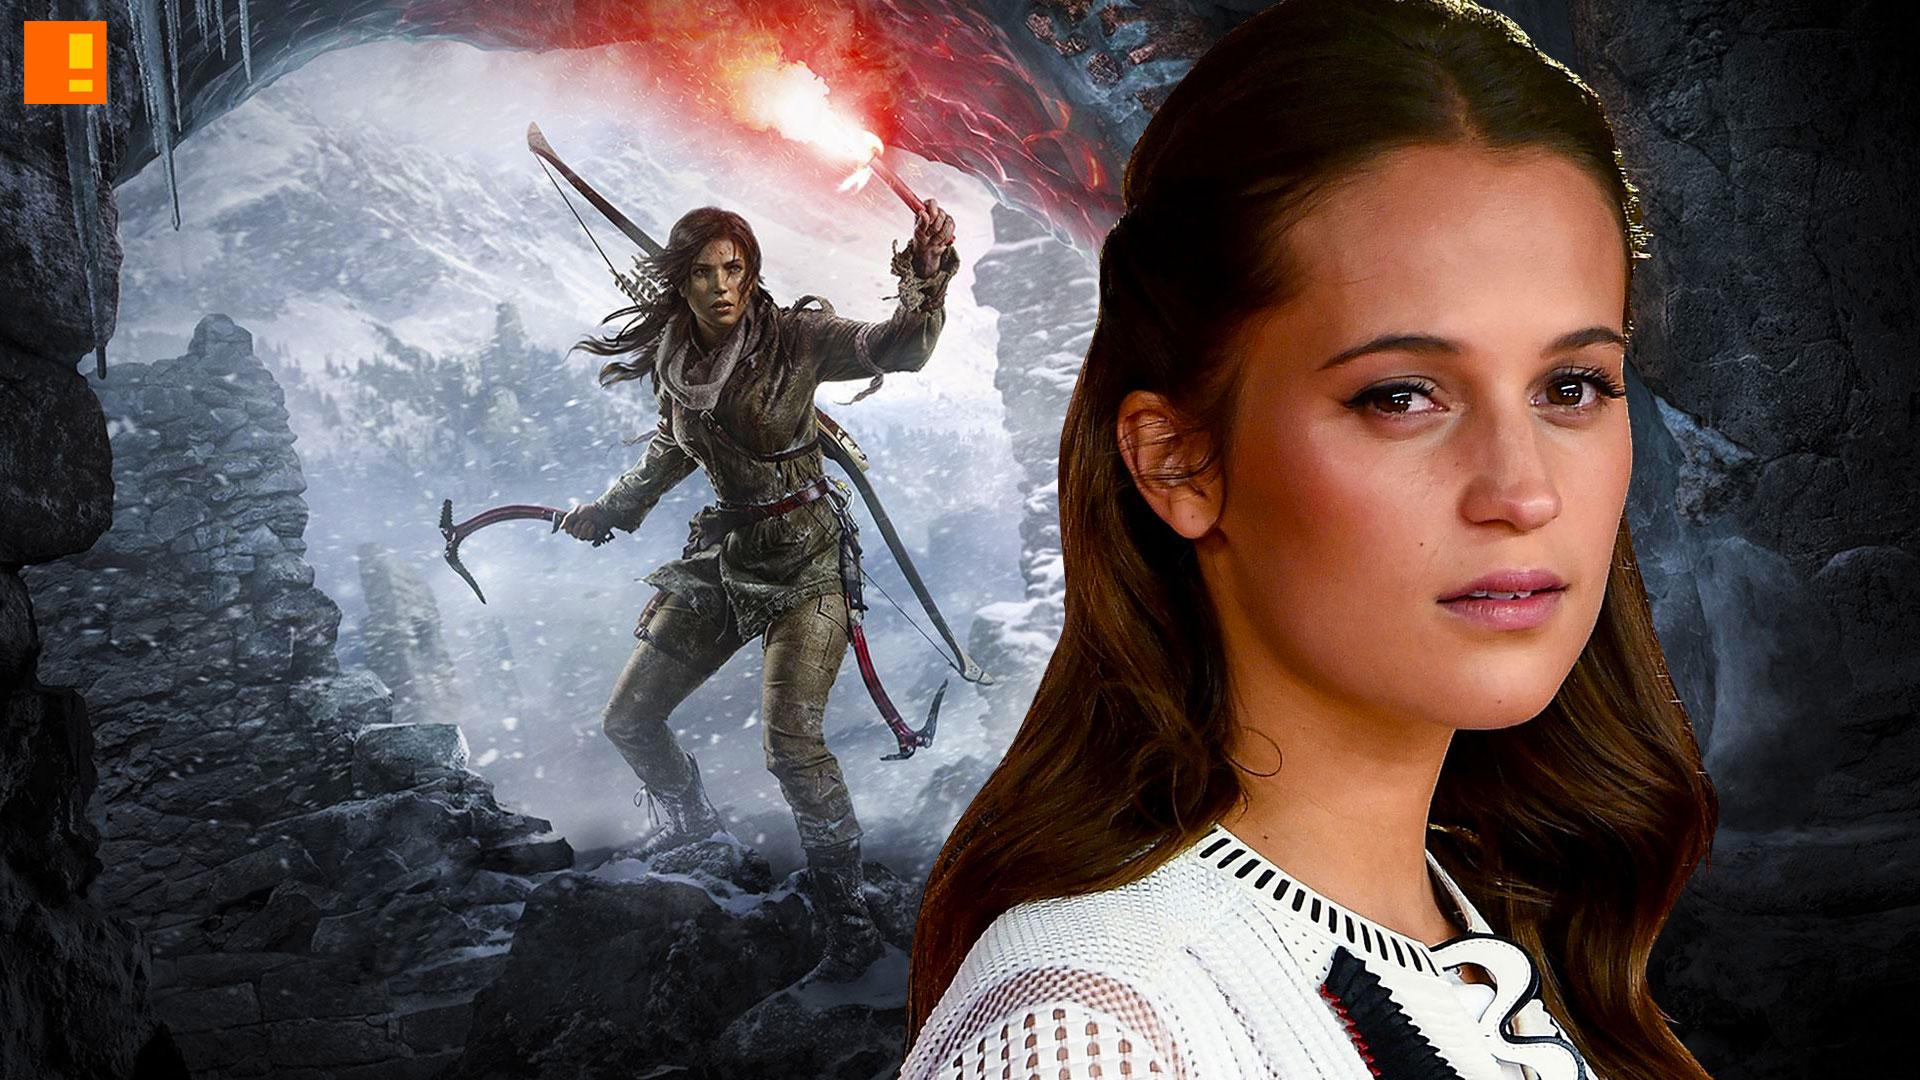 Alicia Vikander, lara croft, tomb raider, casting, reboot, entertainment on tap, game movies, ex-machinima,jason bourne